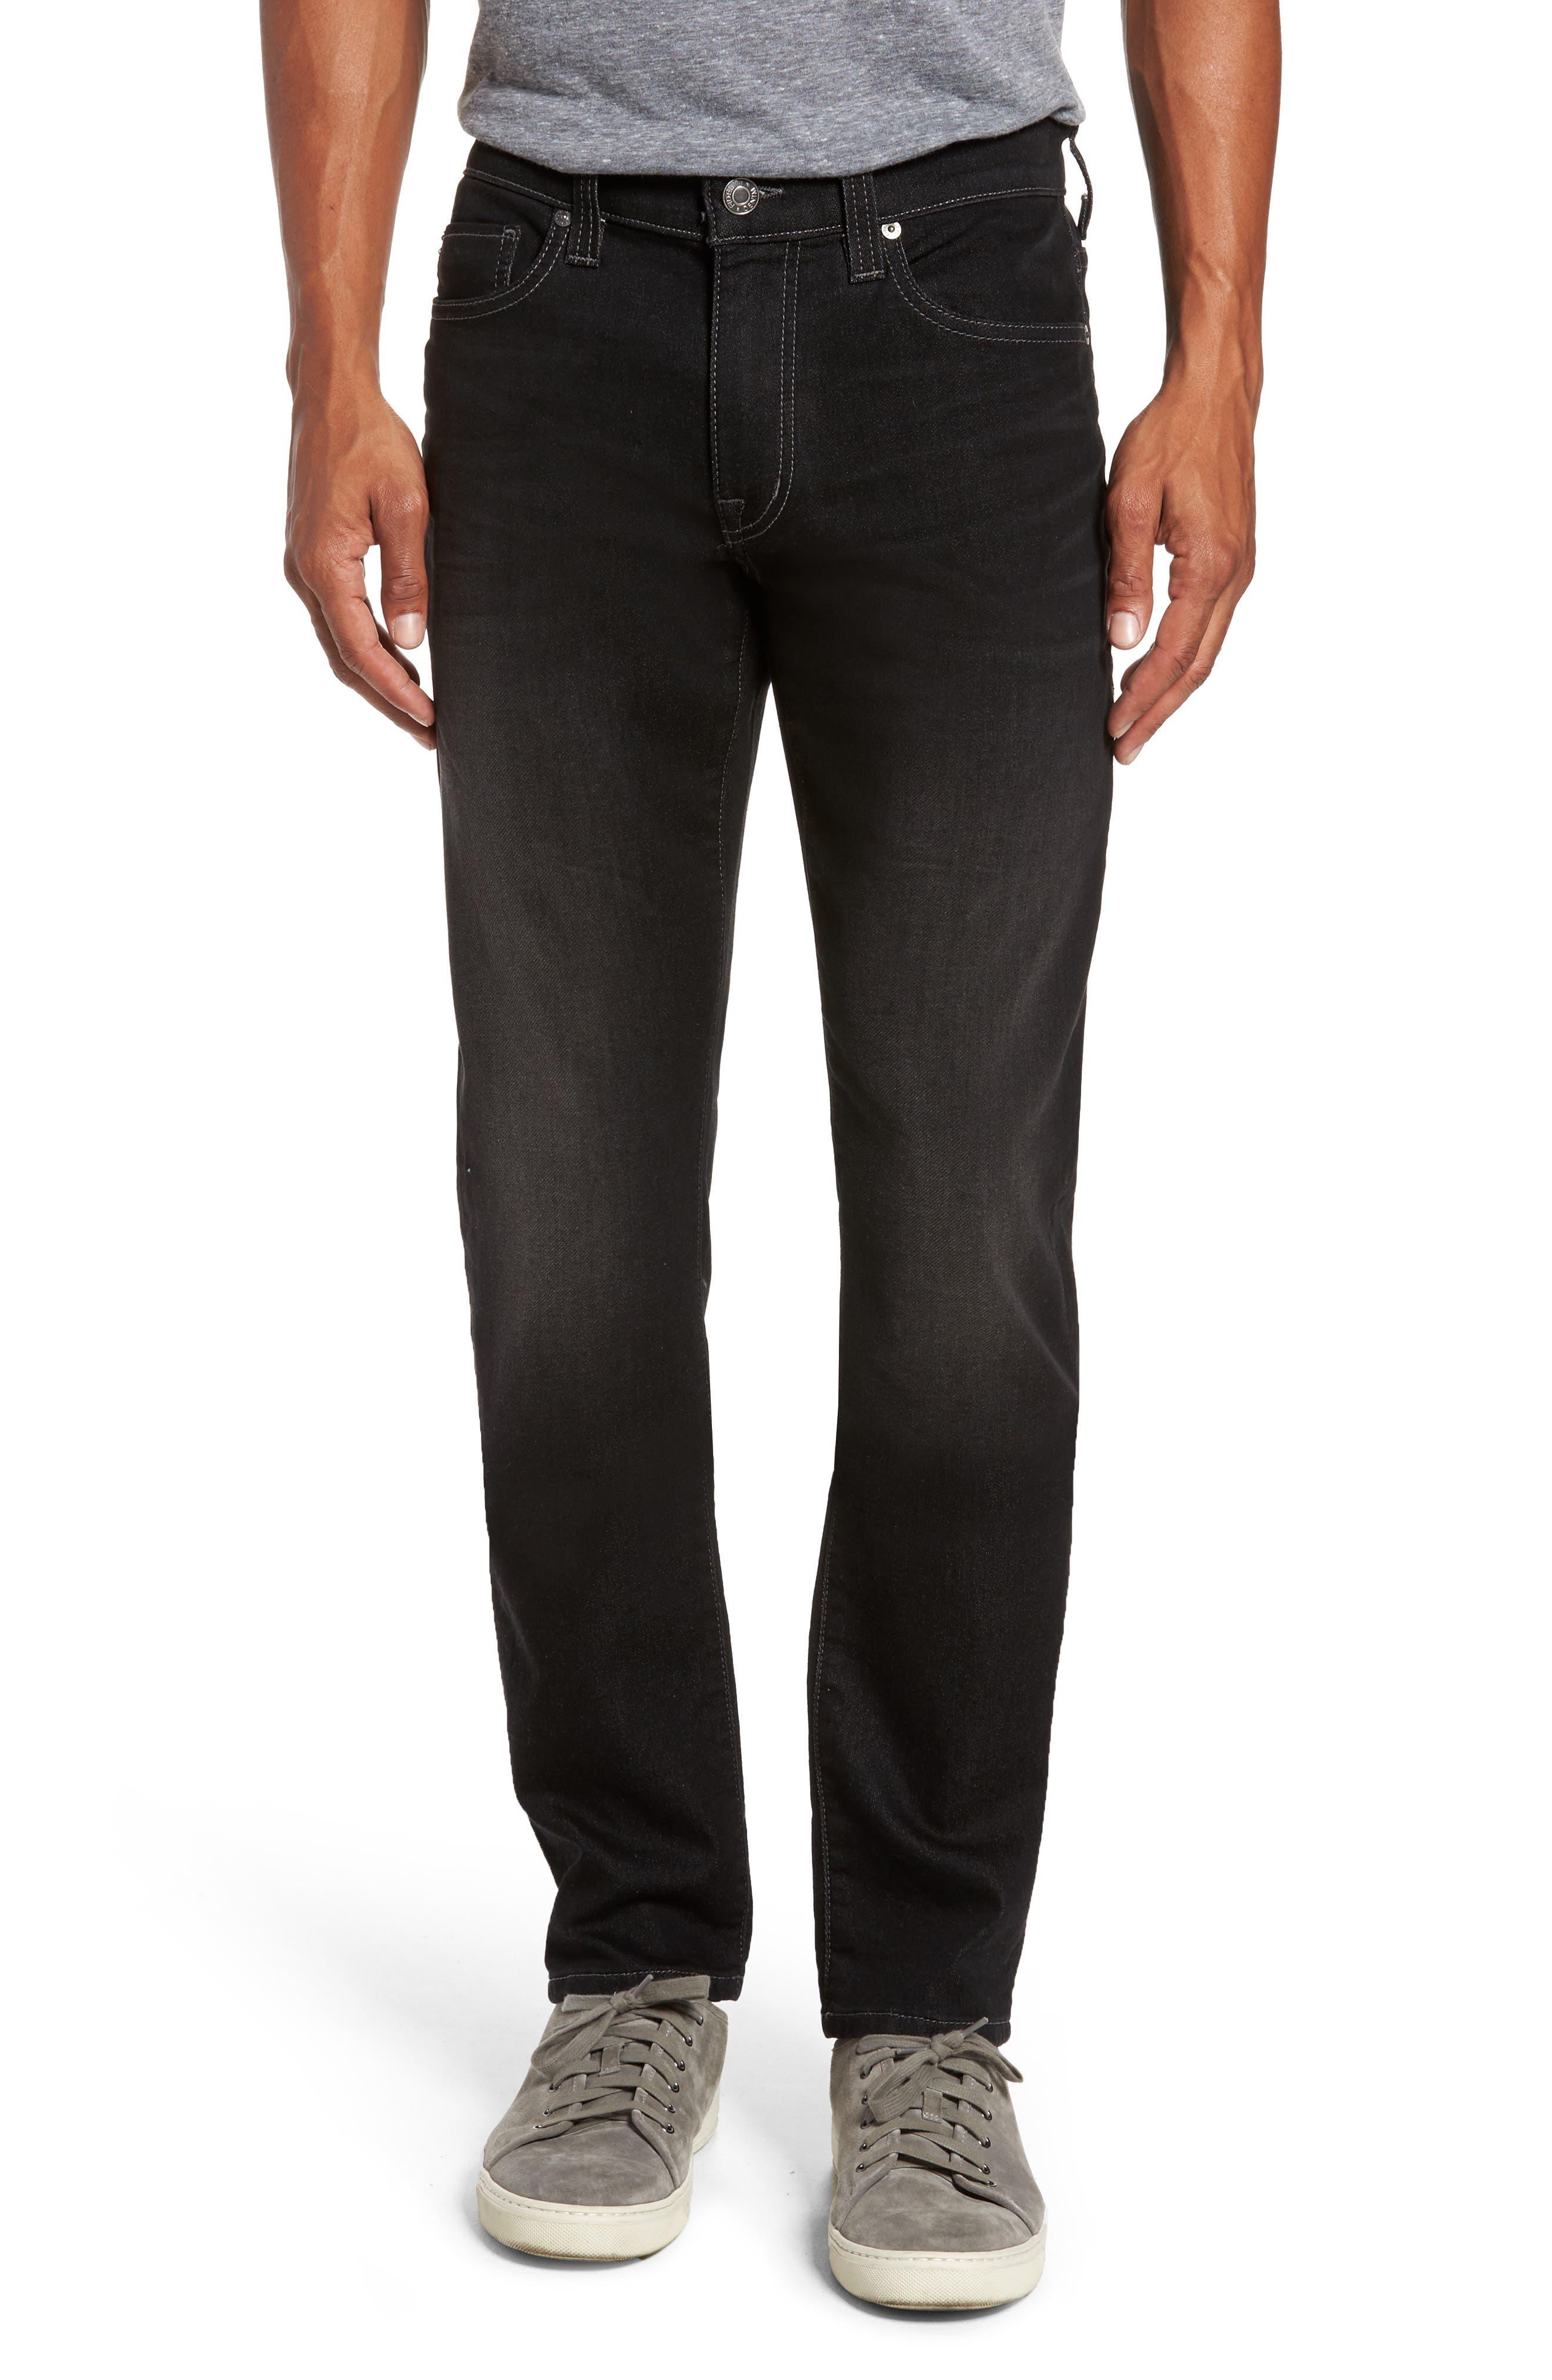 Torino Slim Fit Jeans,                         Main,                         color, Oxy Black On Black